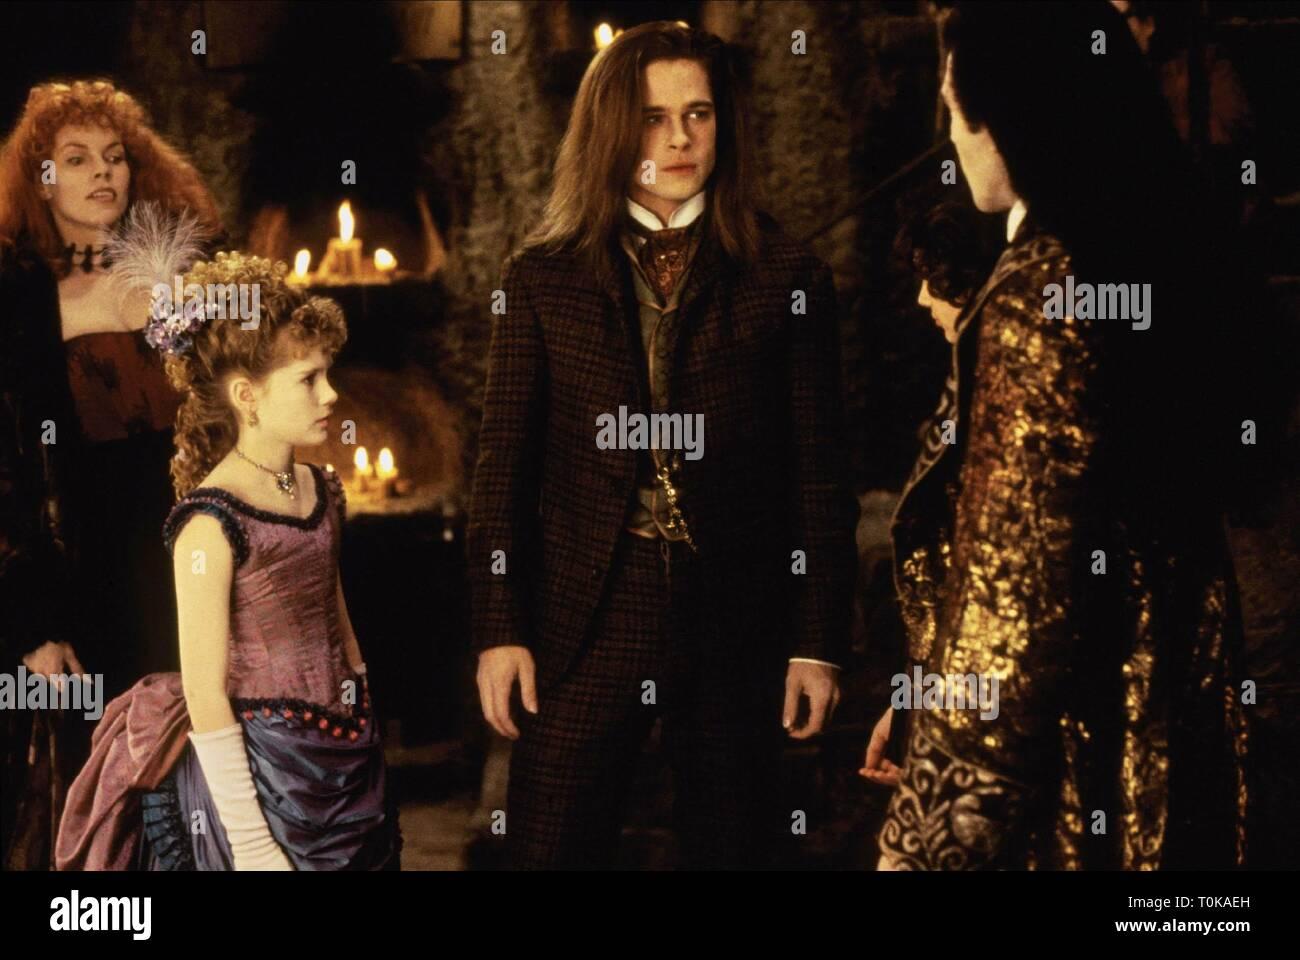 Kirsten Dunst Brad Pitt Antonio Banderas Interview With The Vampire The Vampire Chronicles 1994 Stock Photo Alamy